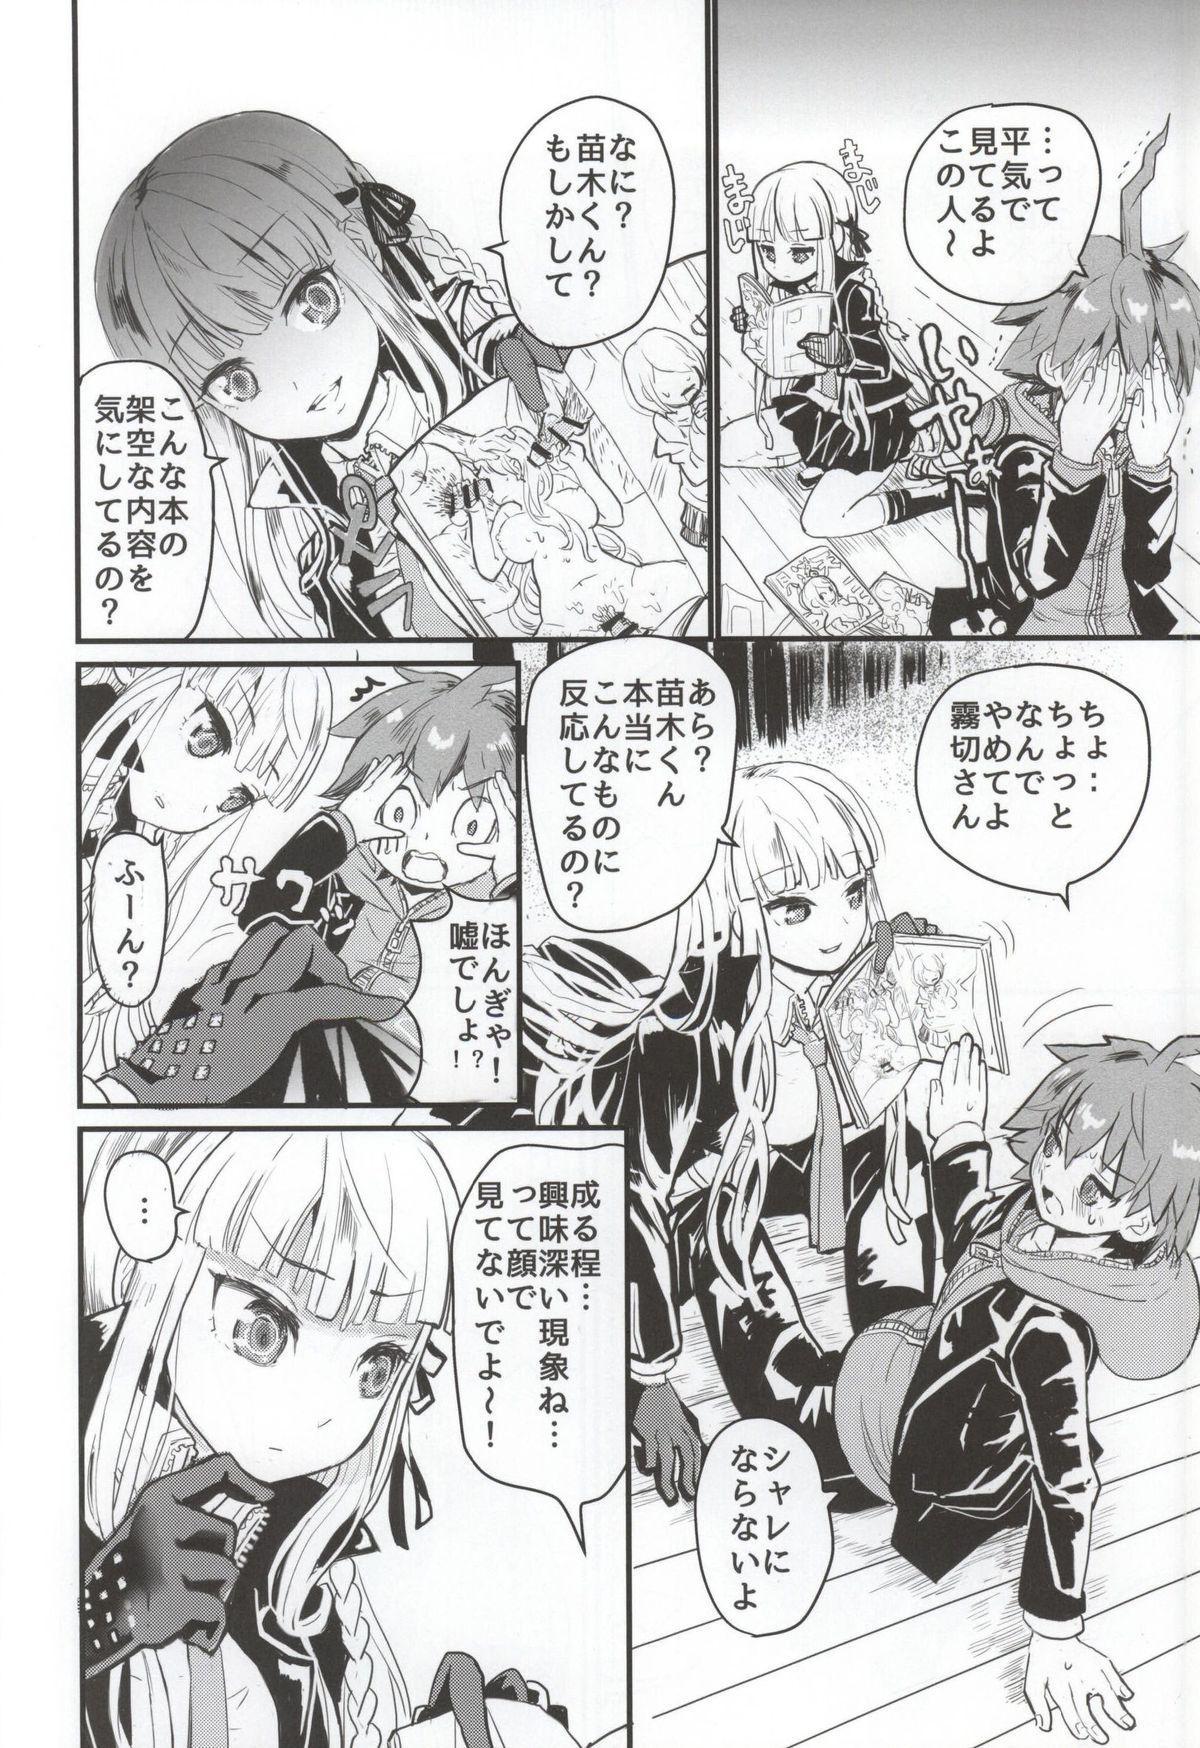 Kirigiri-san to Issho ni School Mode 8